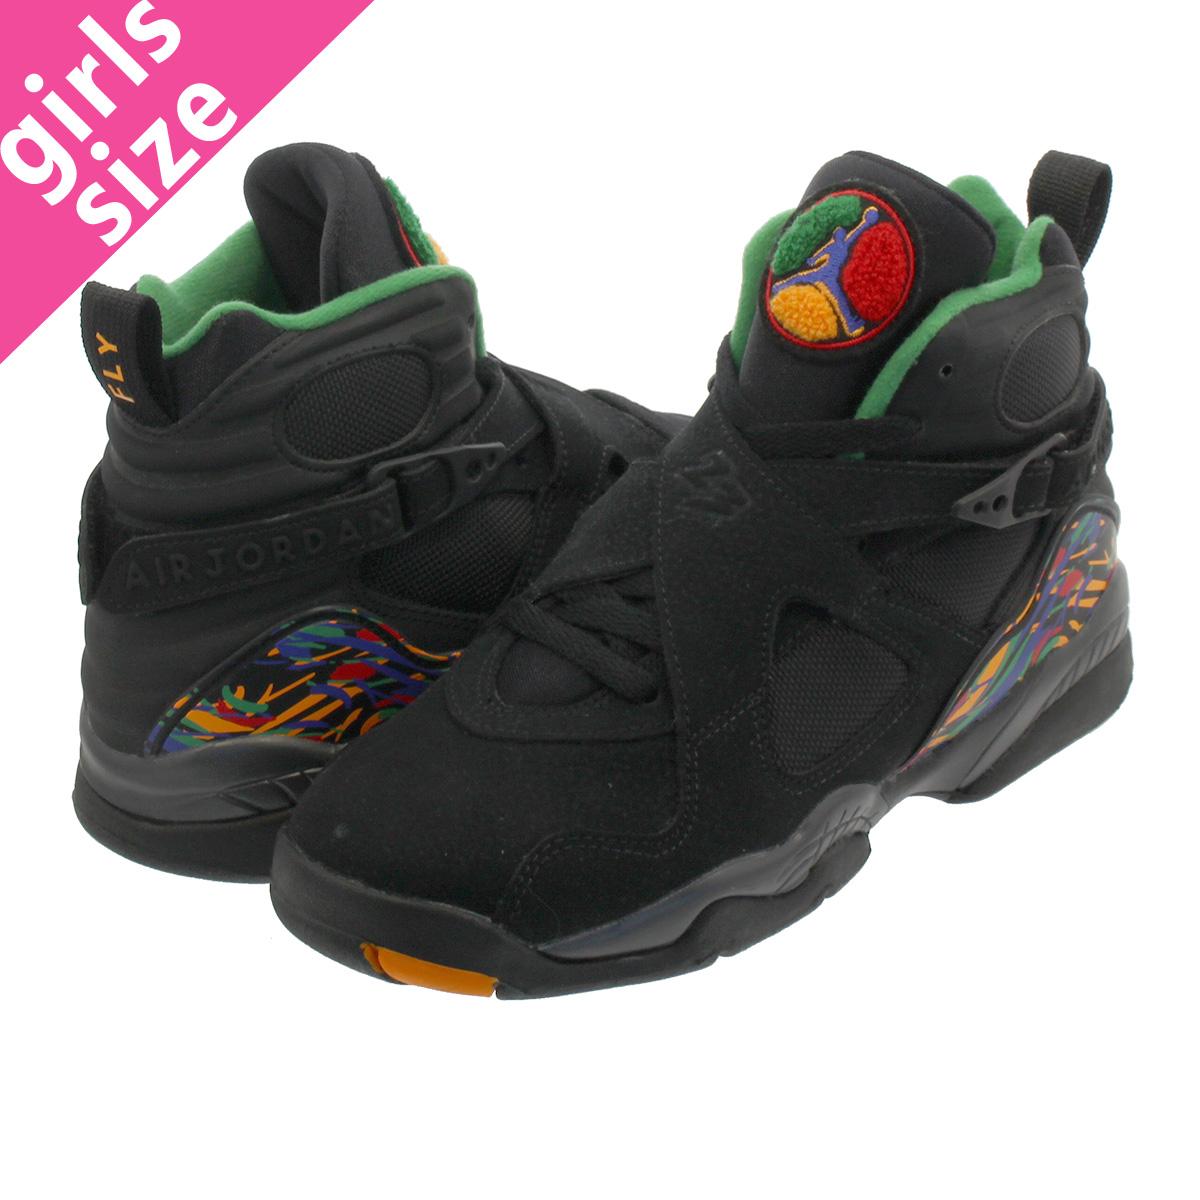 new release huge inventory pick up SELECT SHOP LOWTEX: NIKE AIR JORDAN 8 RETRO GS Nike Air Jordan 8 ...